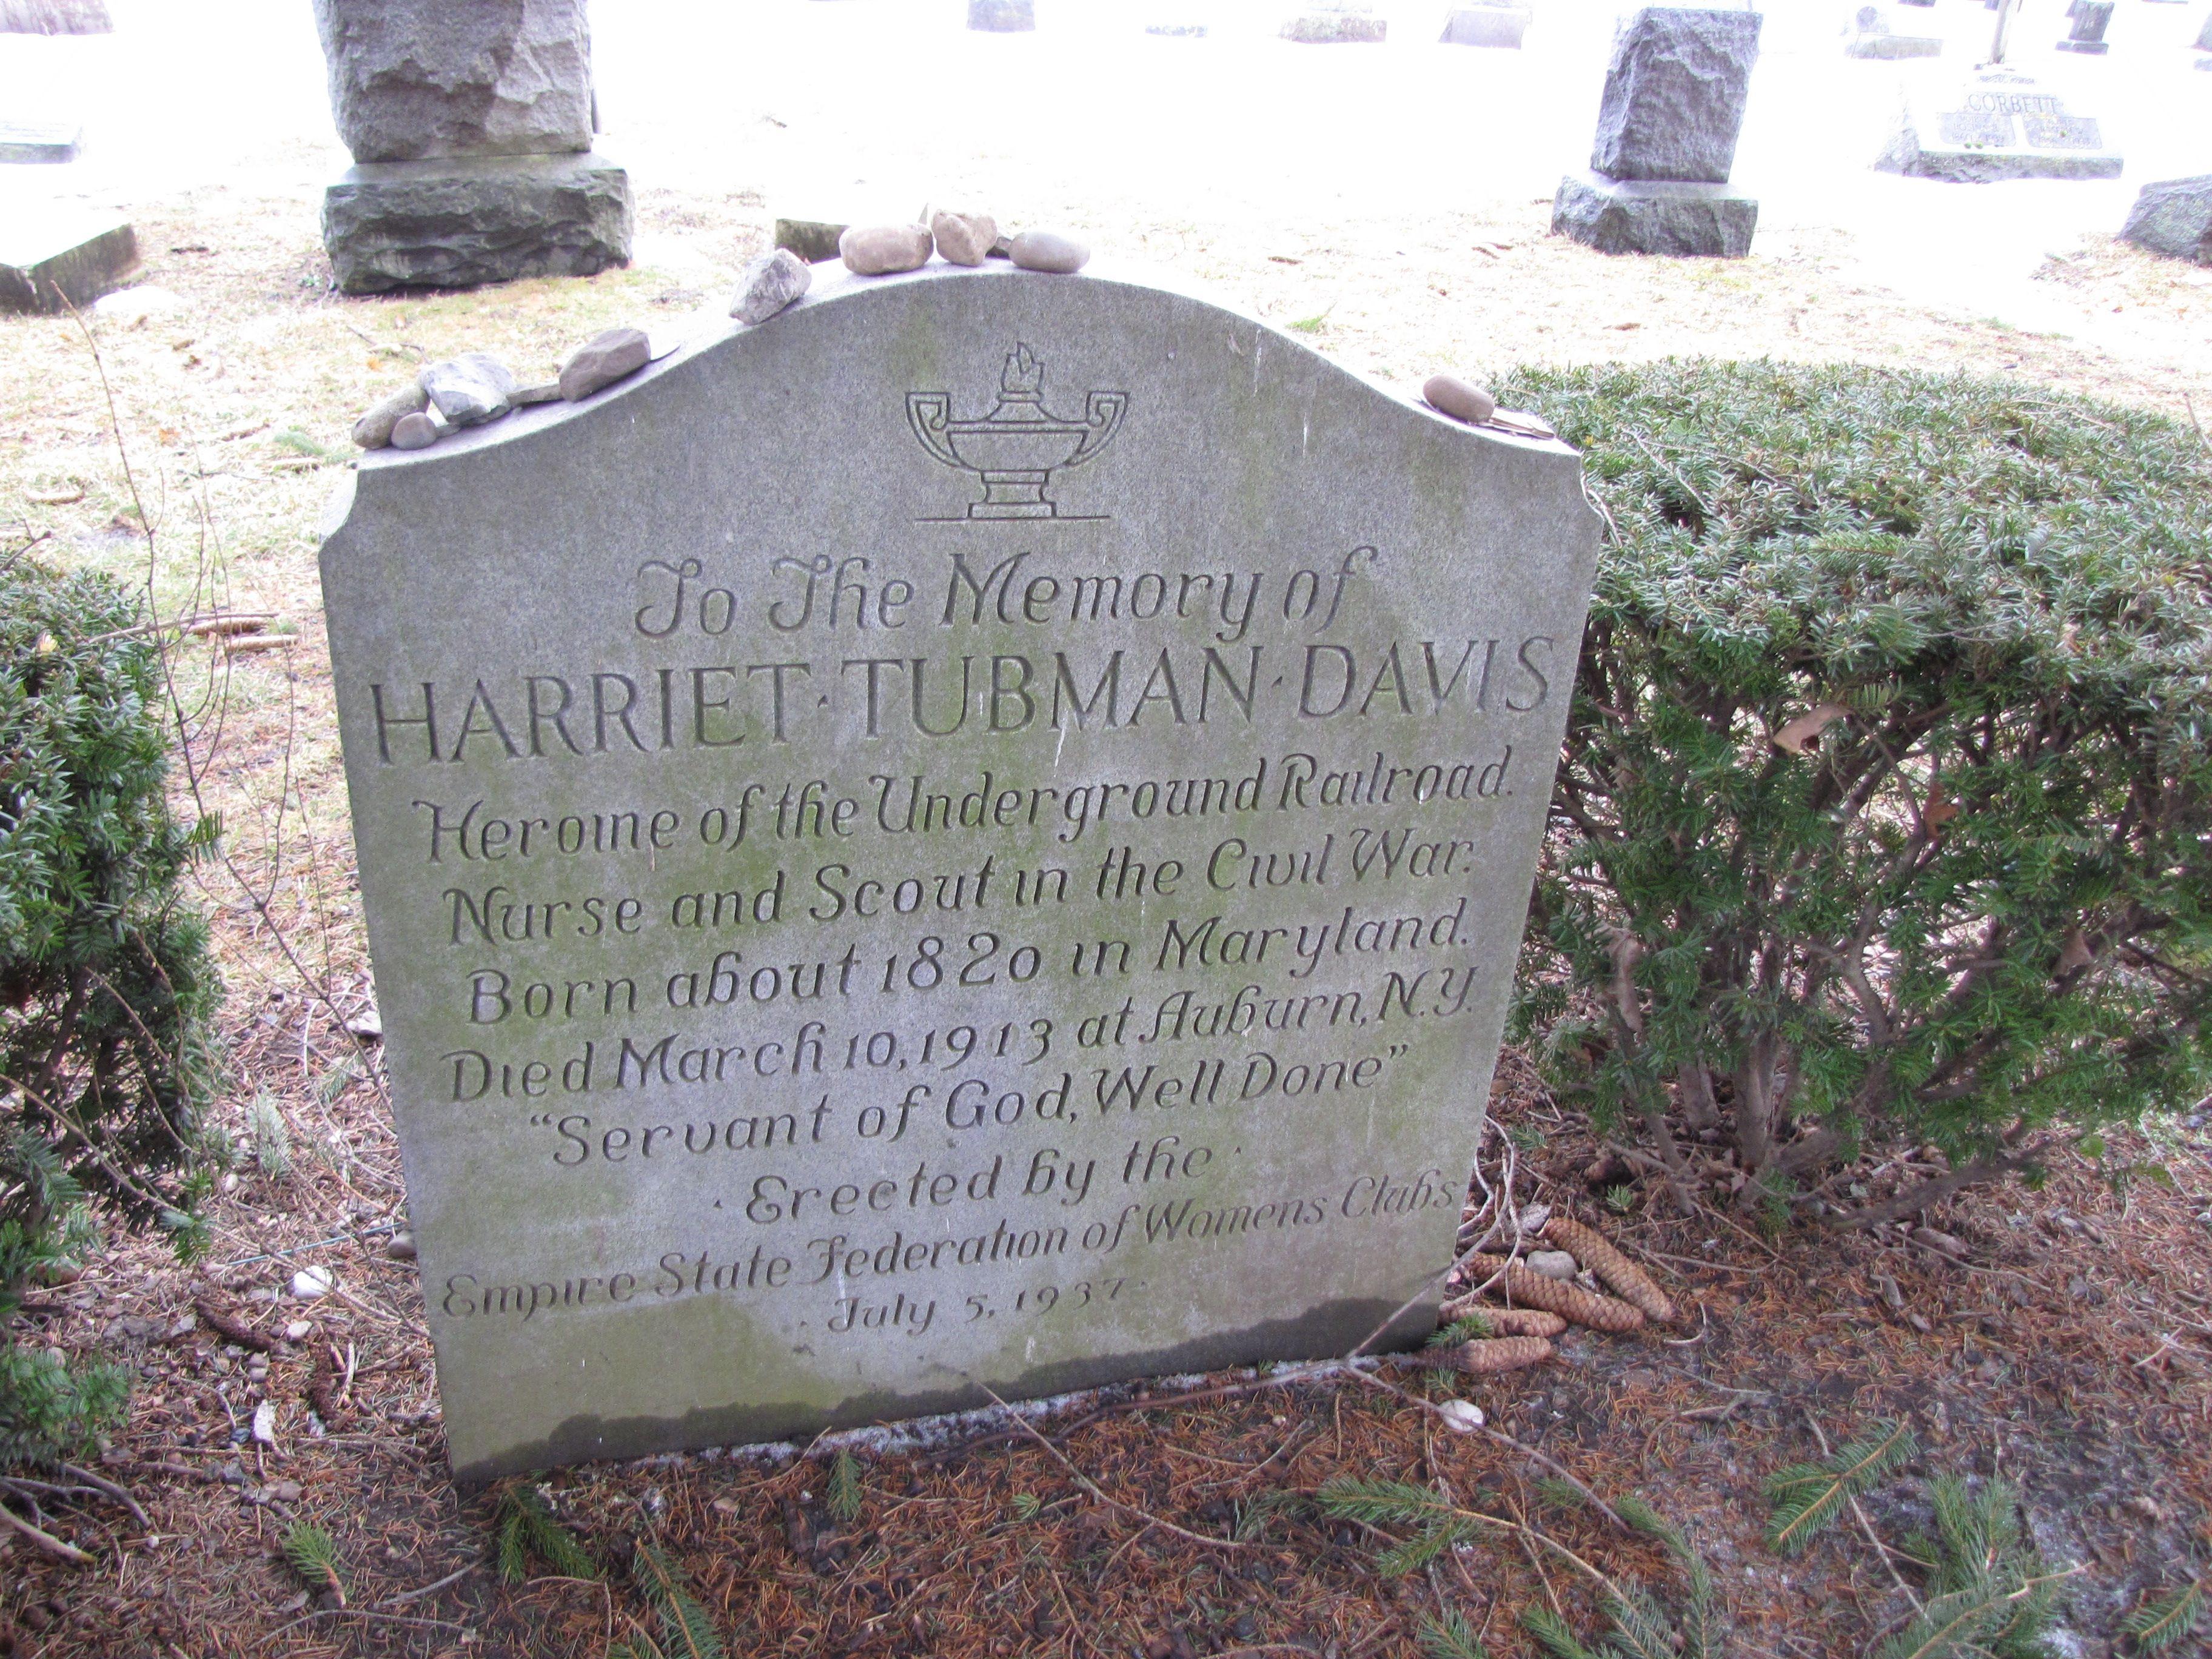 Harriet Tubman Gravesite, Fort Hill Cemetery, Auburn, Ny William Seward,  President Lincoln's